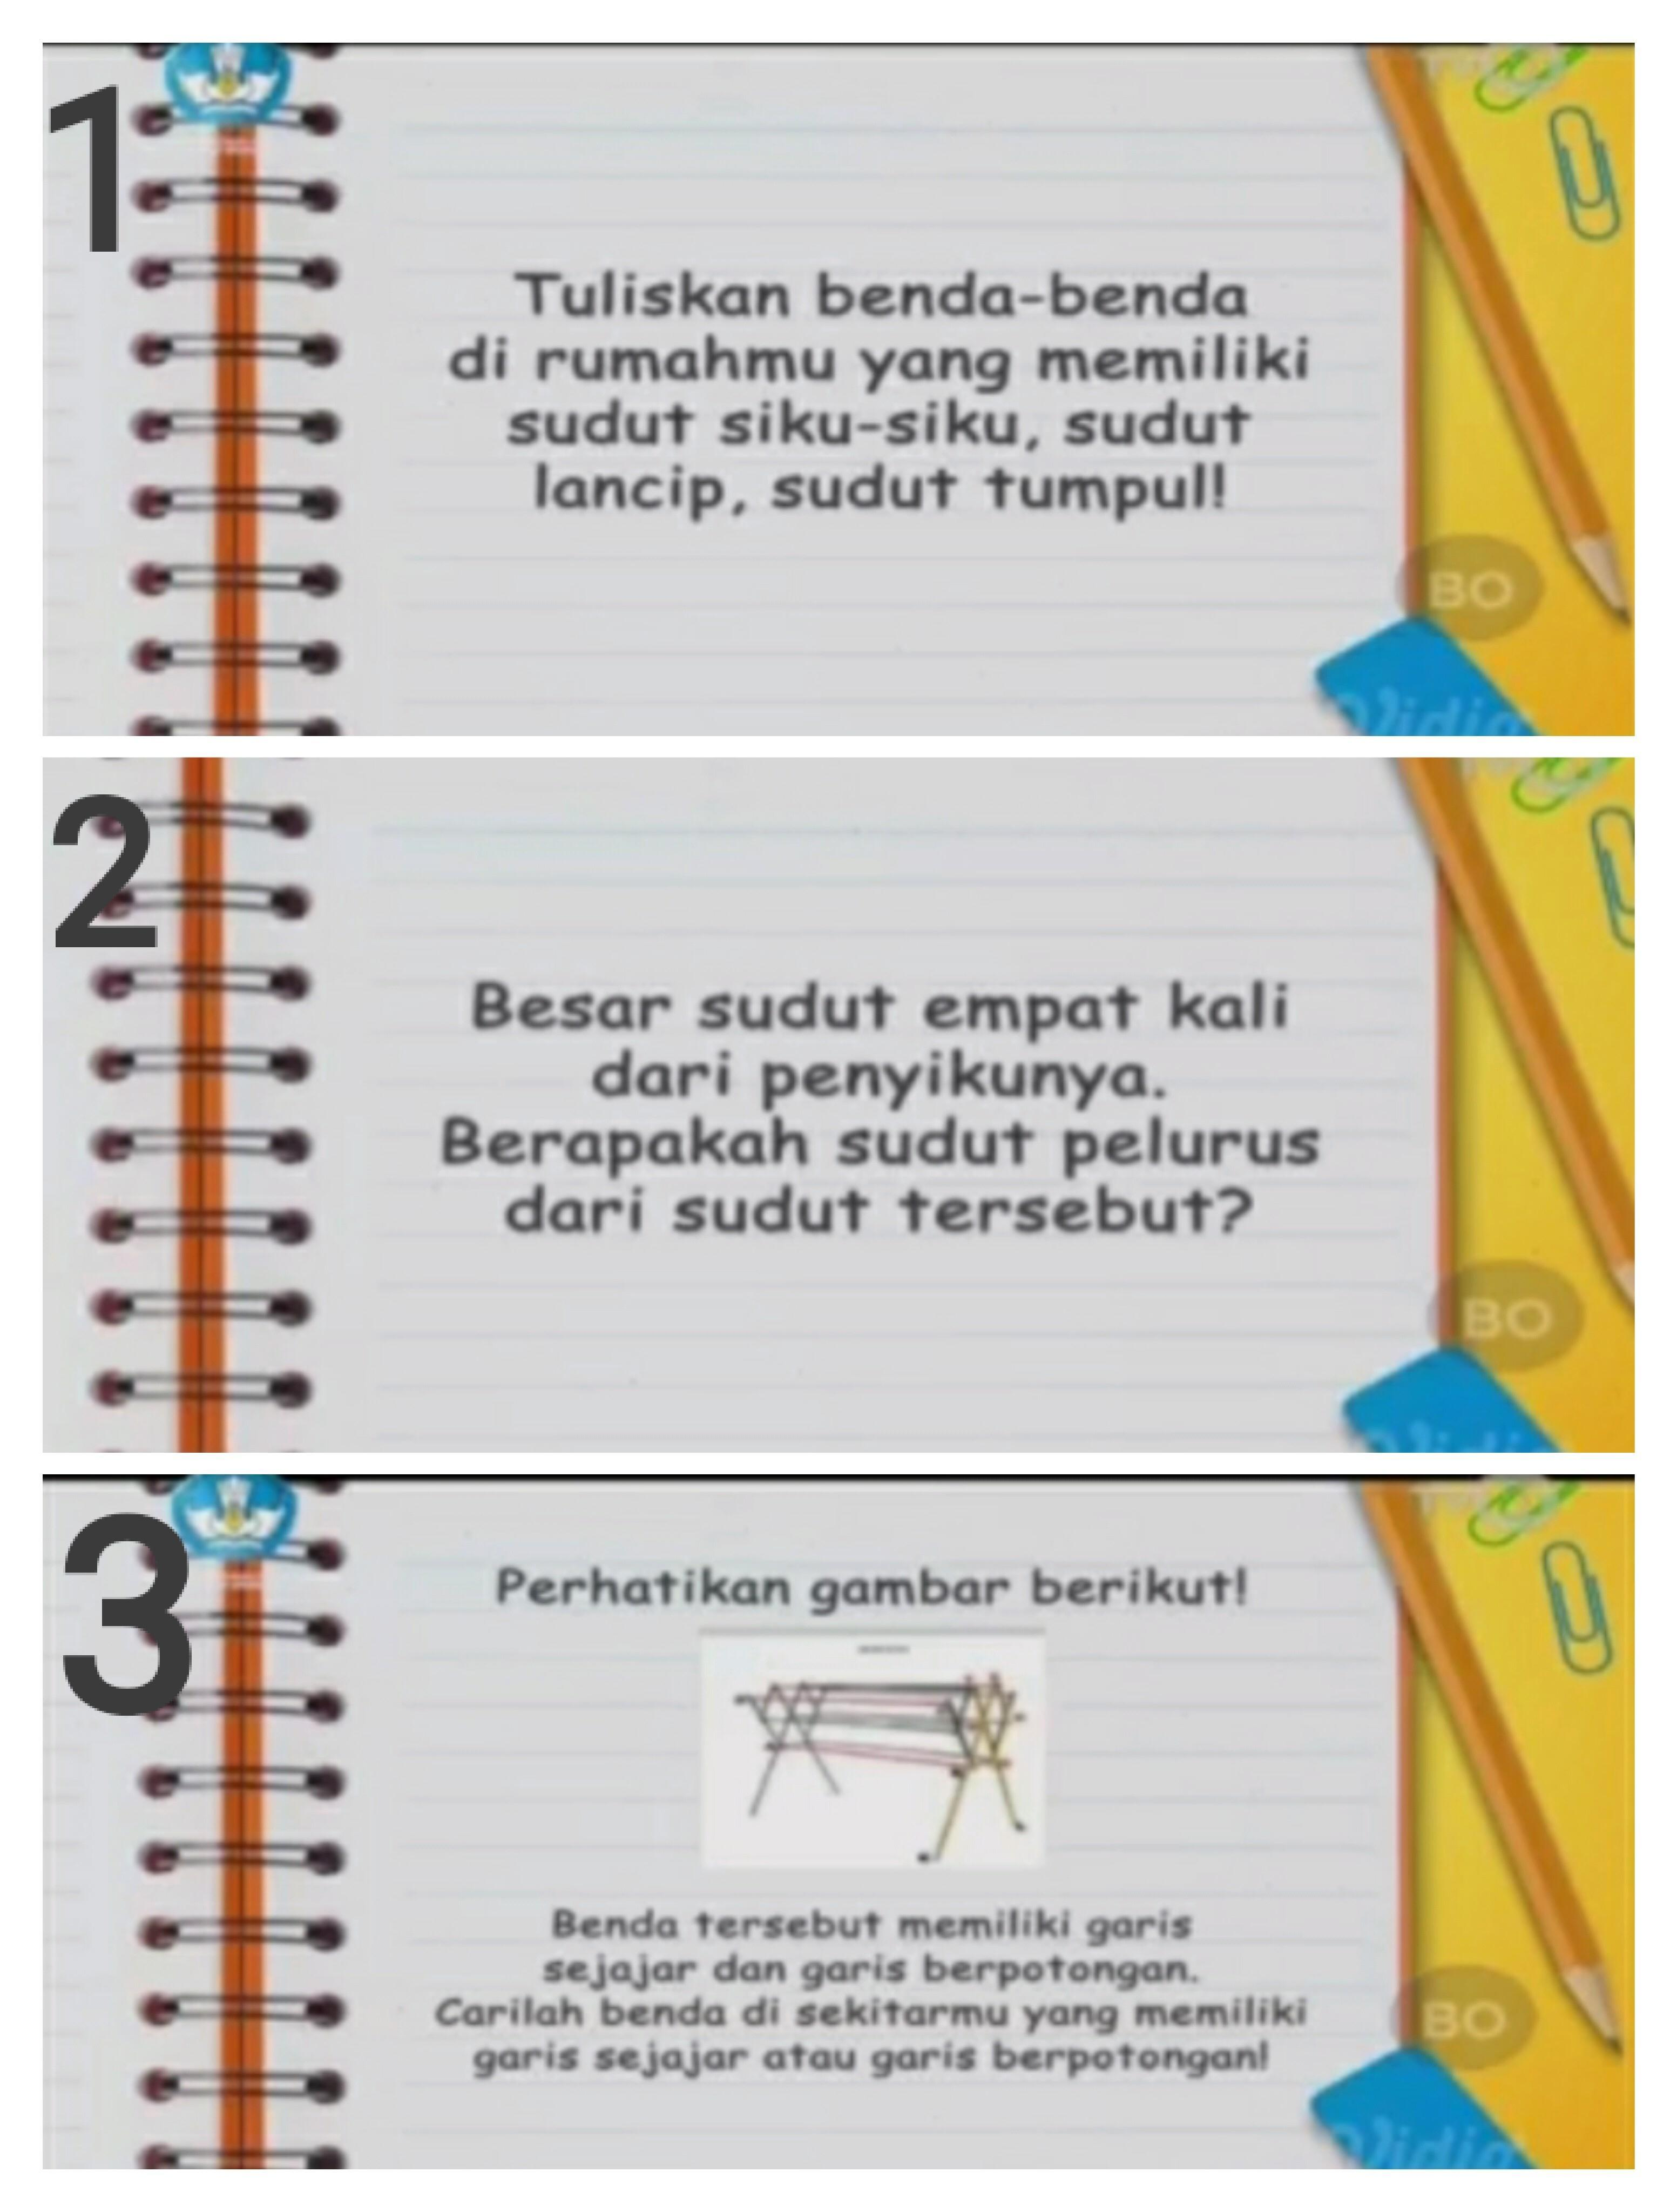 Tuliskan Benda-benda Di Rumahmu Yang Memiliki Sudut Siku-siku Sudut Lancip Dan Sudut Tumpul : tuliskan, benda-benda, rumahmu, memiliki, sudut, siku-siku, lancip, tumpul, Jawablah, Dibawah, Jawab, Beserta, Penjelasan, Caranya!, Brainly.co.id